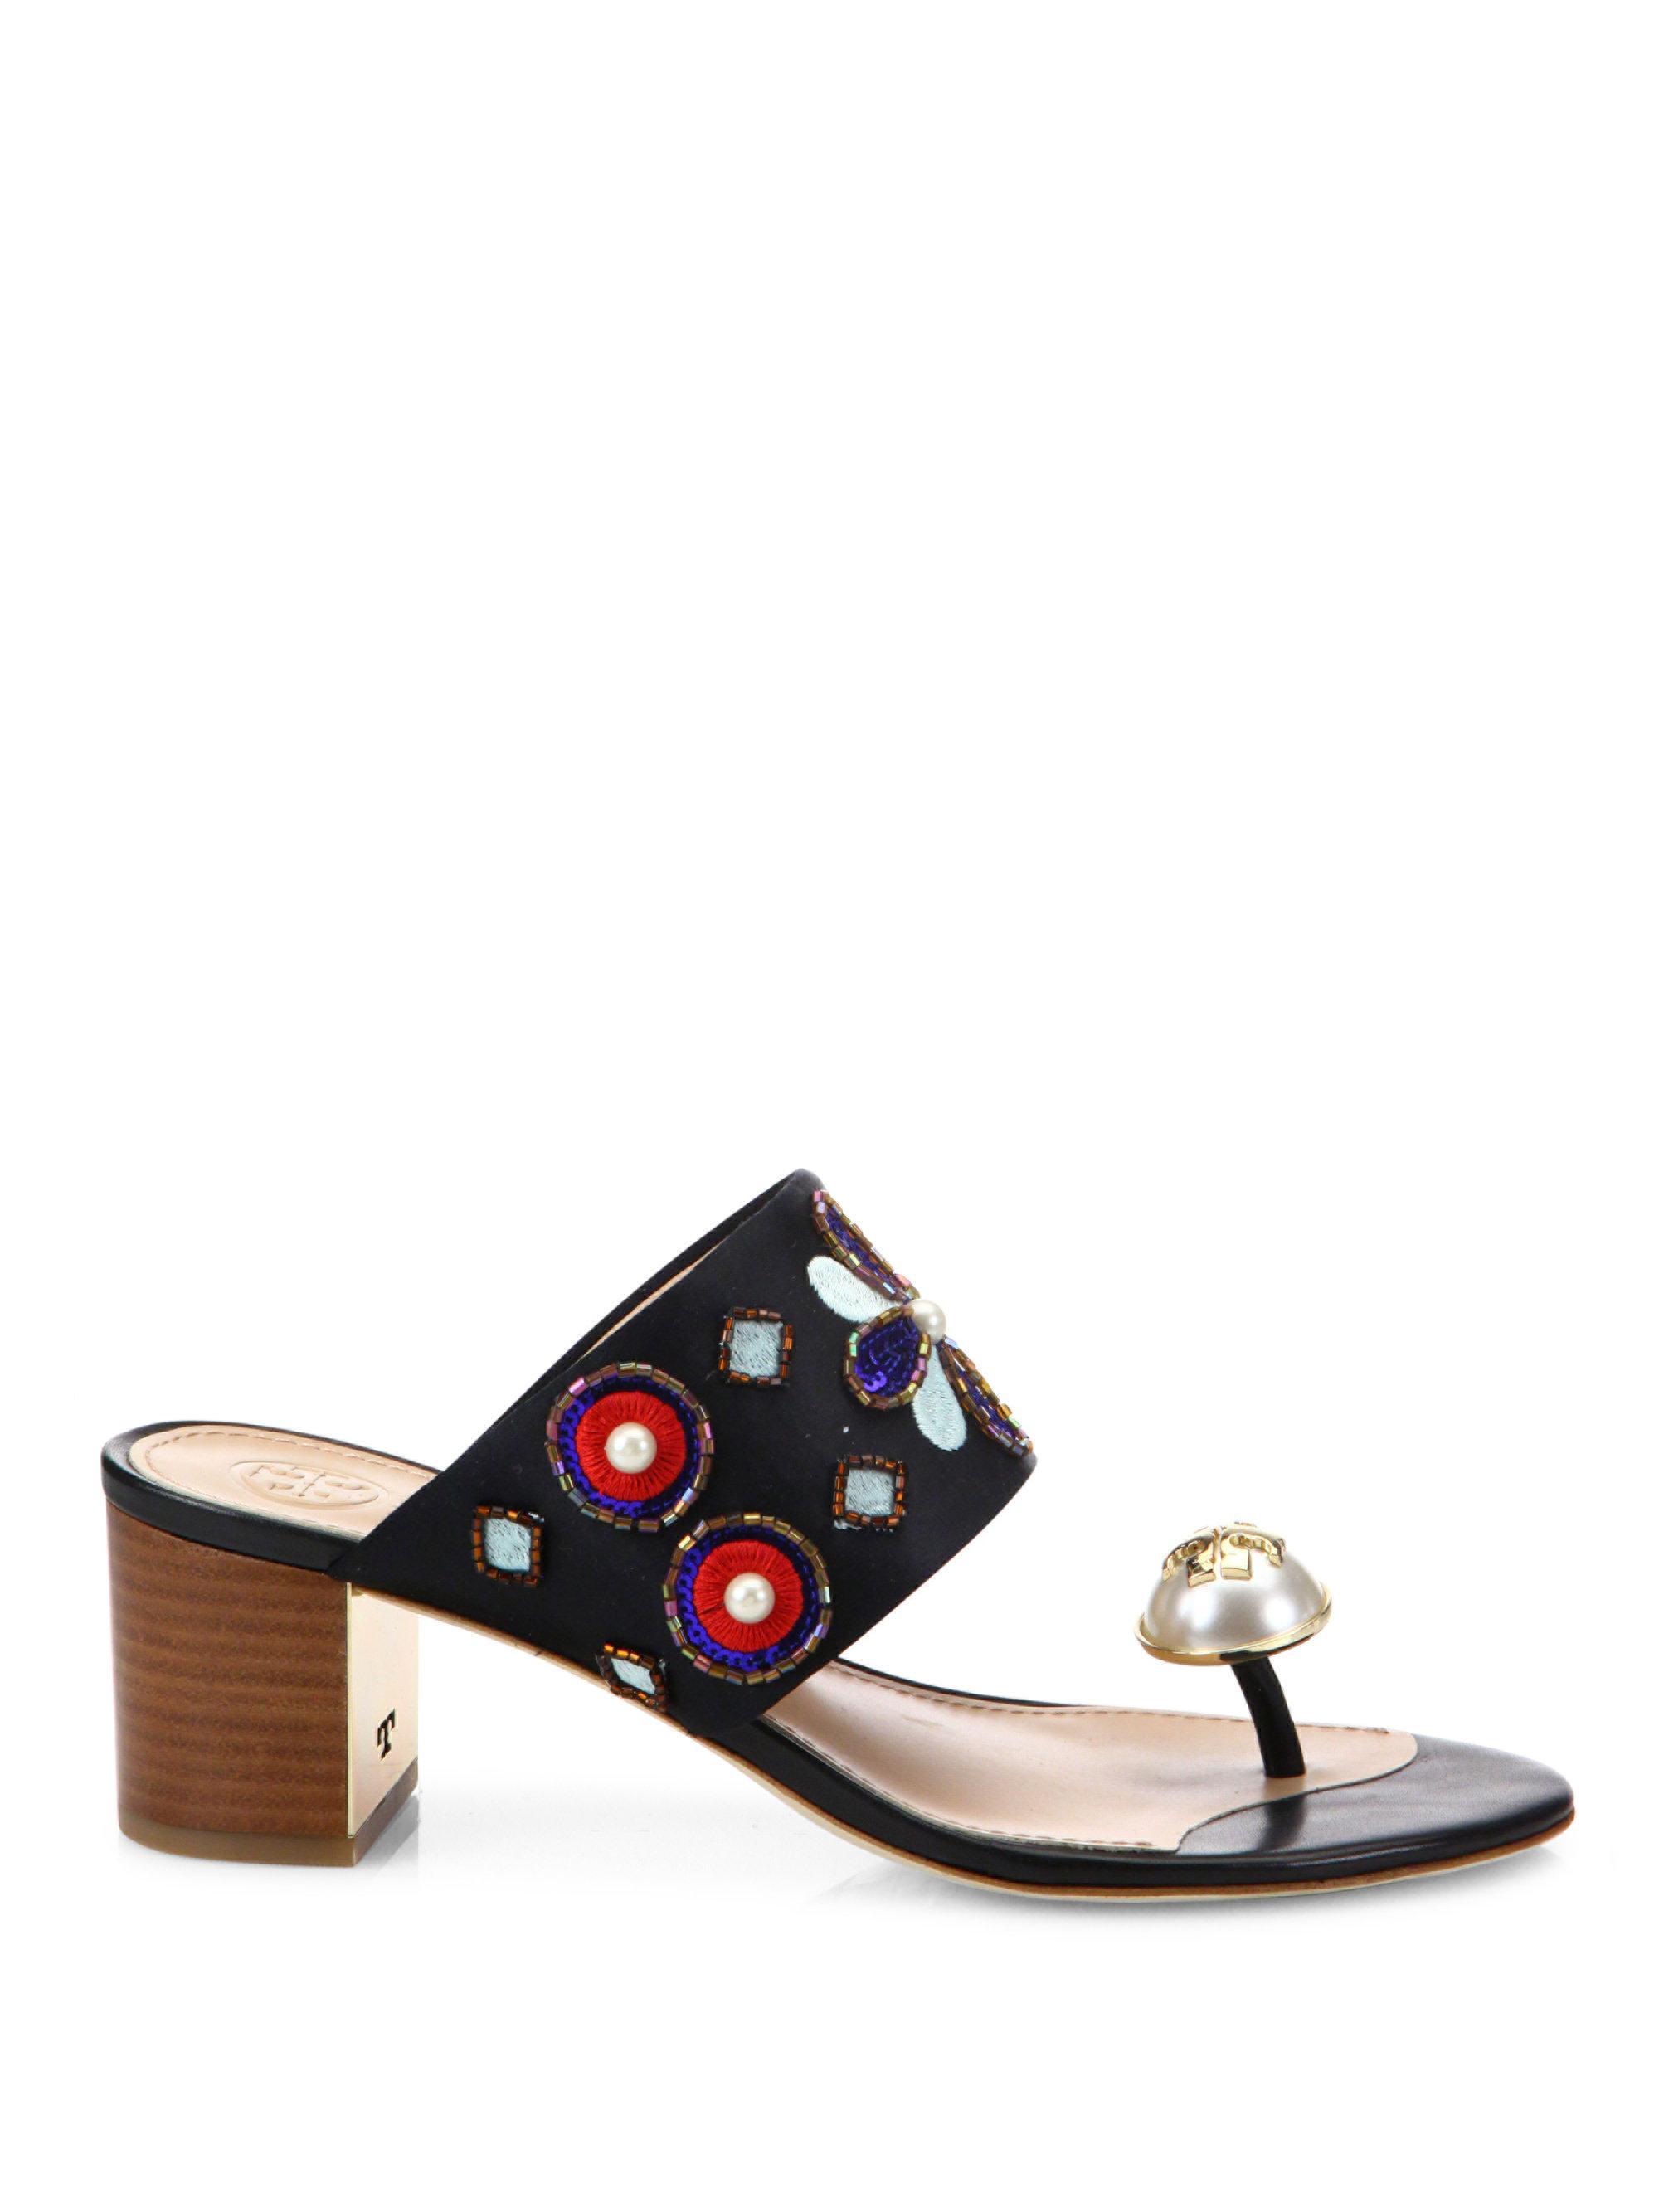 bcc6ea835b5d02 Lyst - Tory Burch Estella Silk Blend Ring Slide Sandals in Black